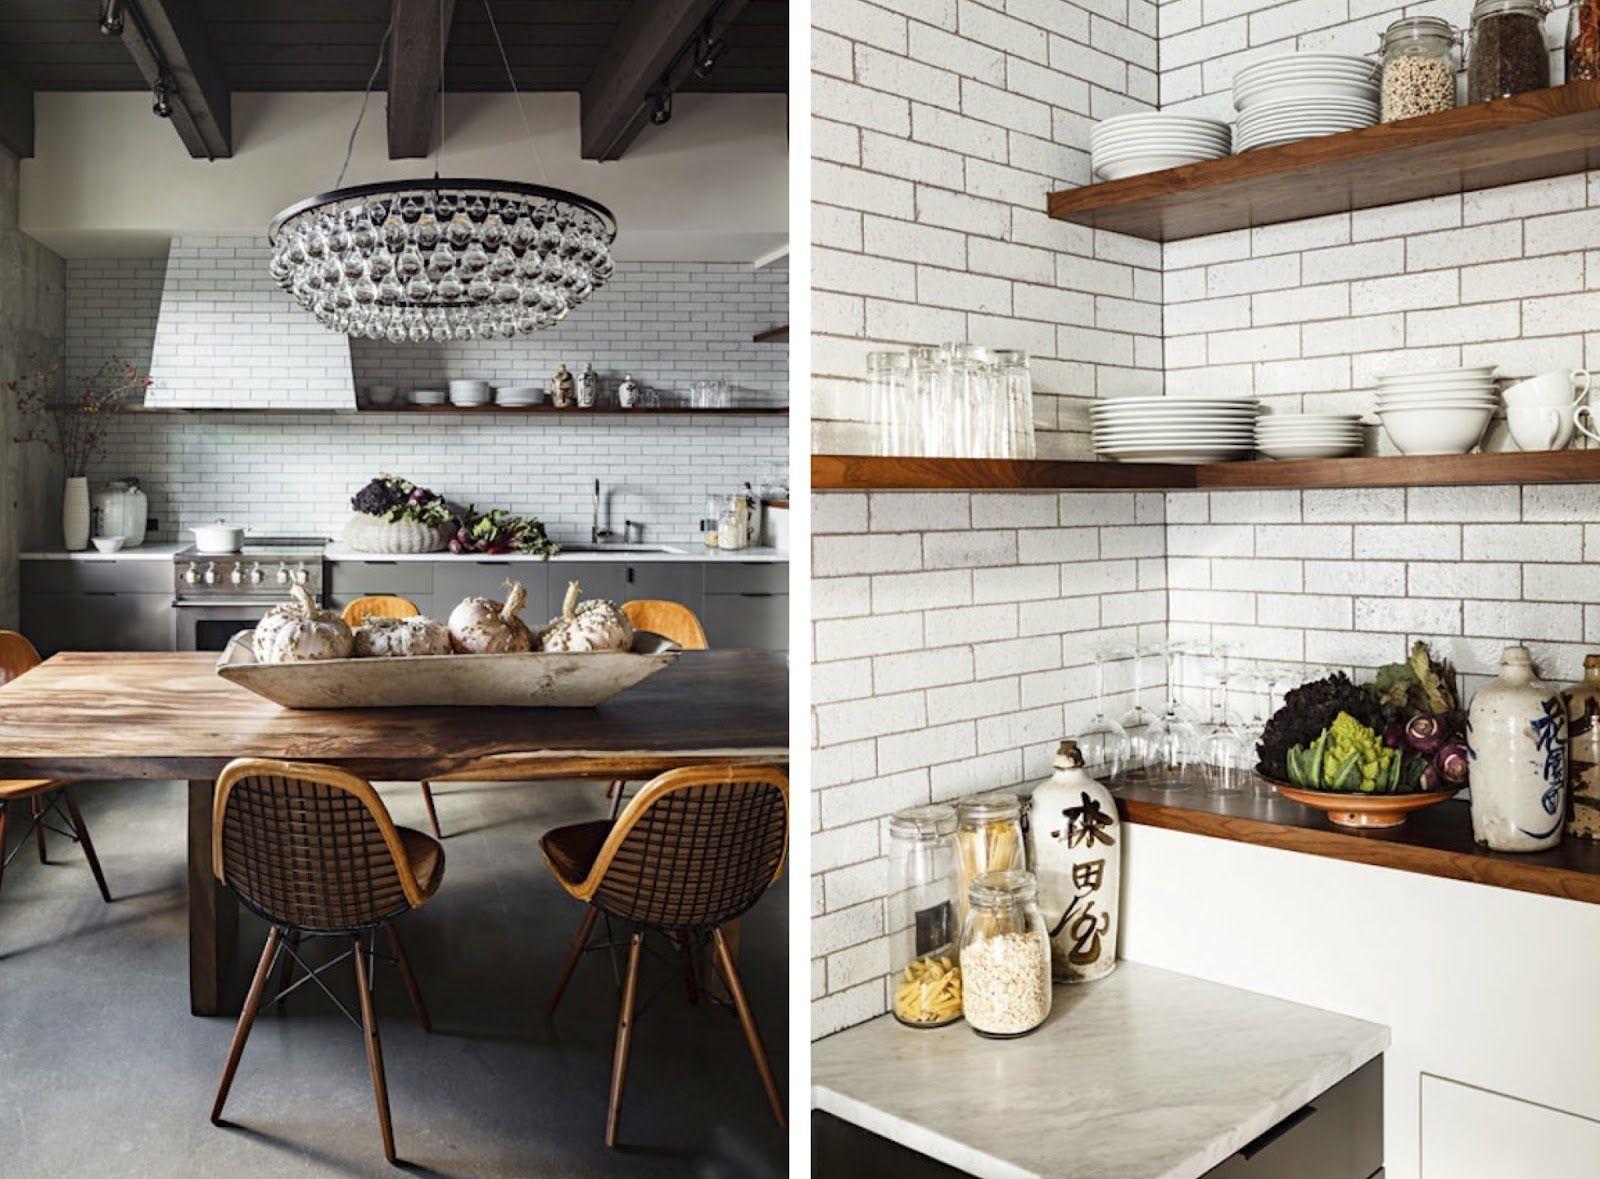 Slab kitchen cabinets  grey kitchen cabinets wood shelves subway tile wooded slab dining